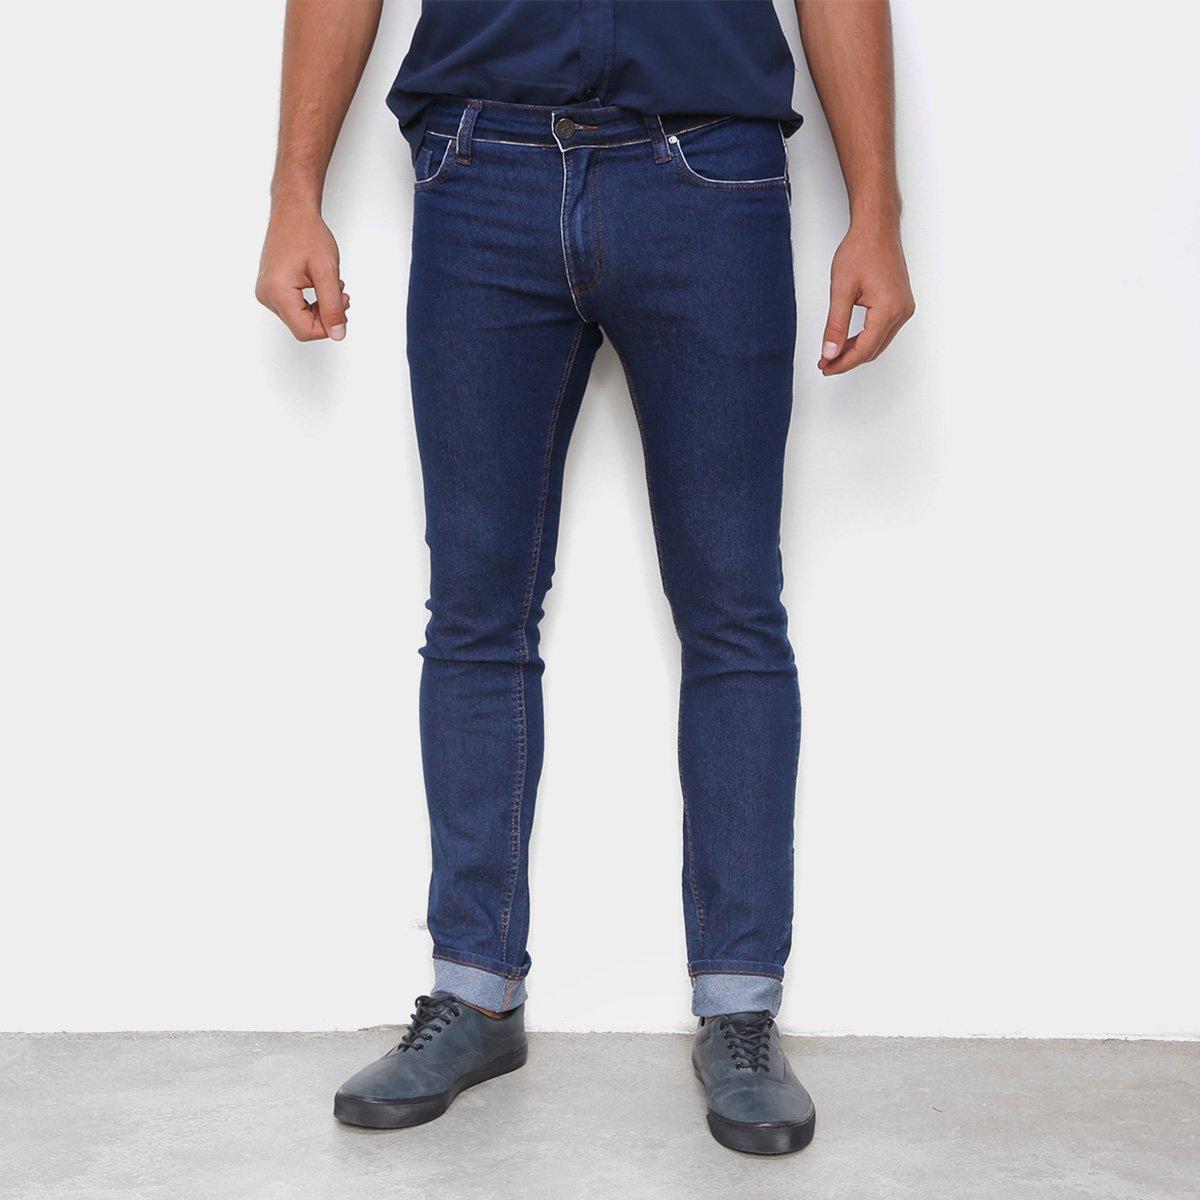 Calça Jeans Colcci Básica Felipe Masculina